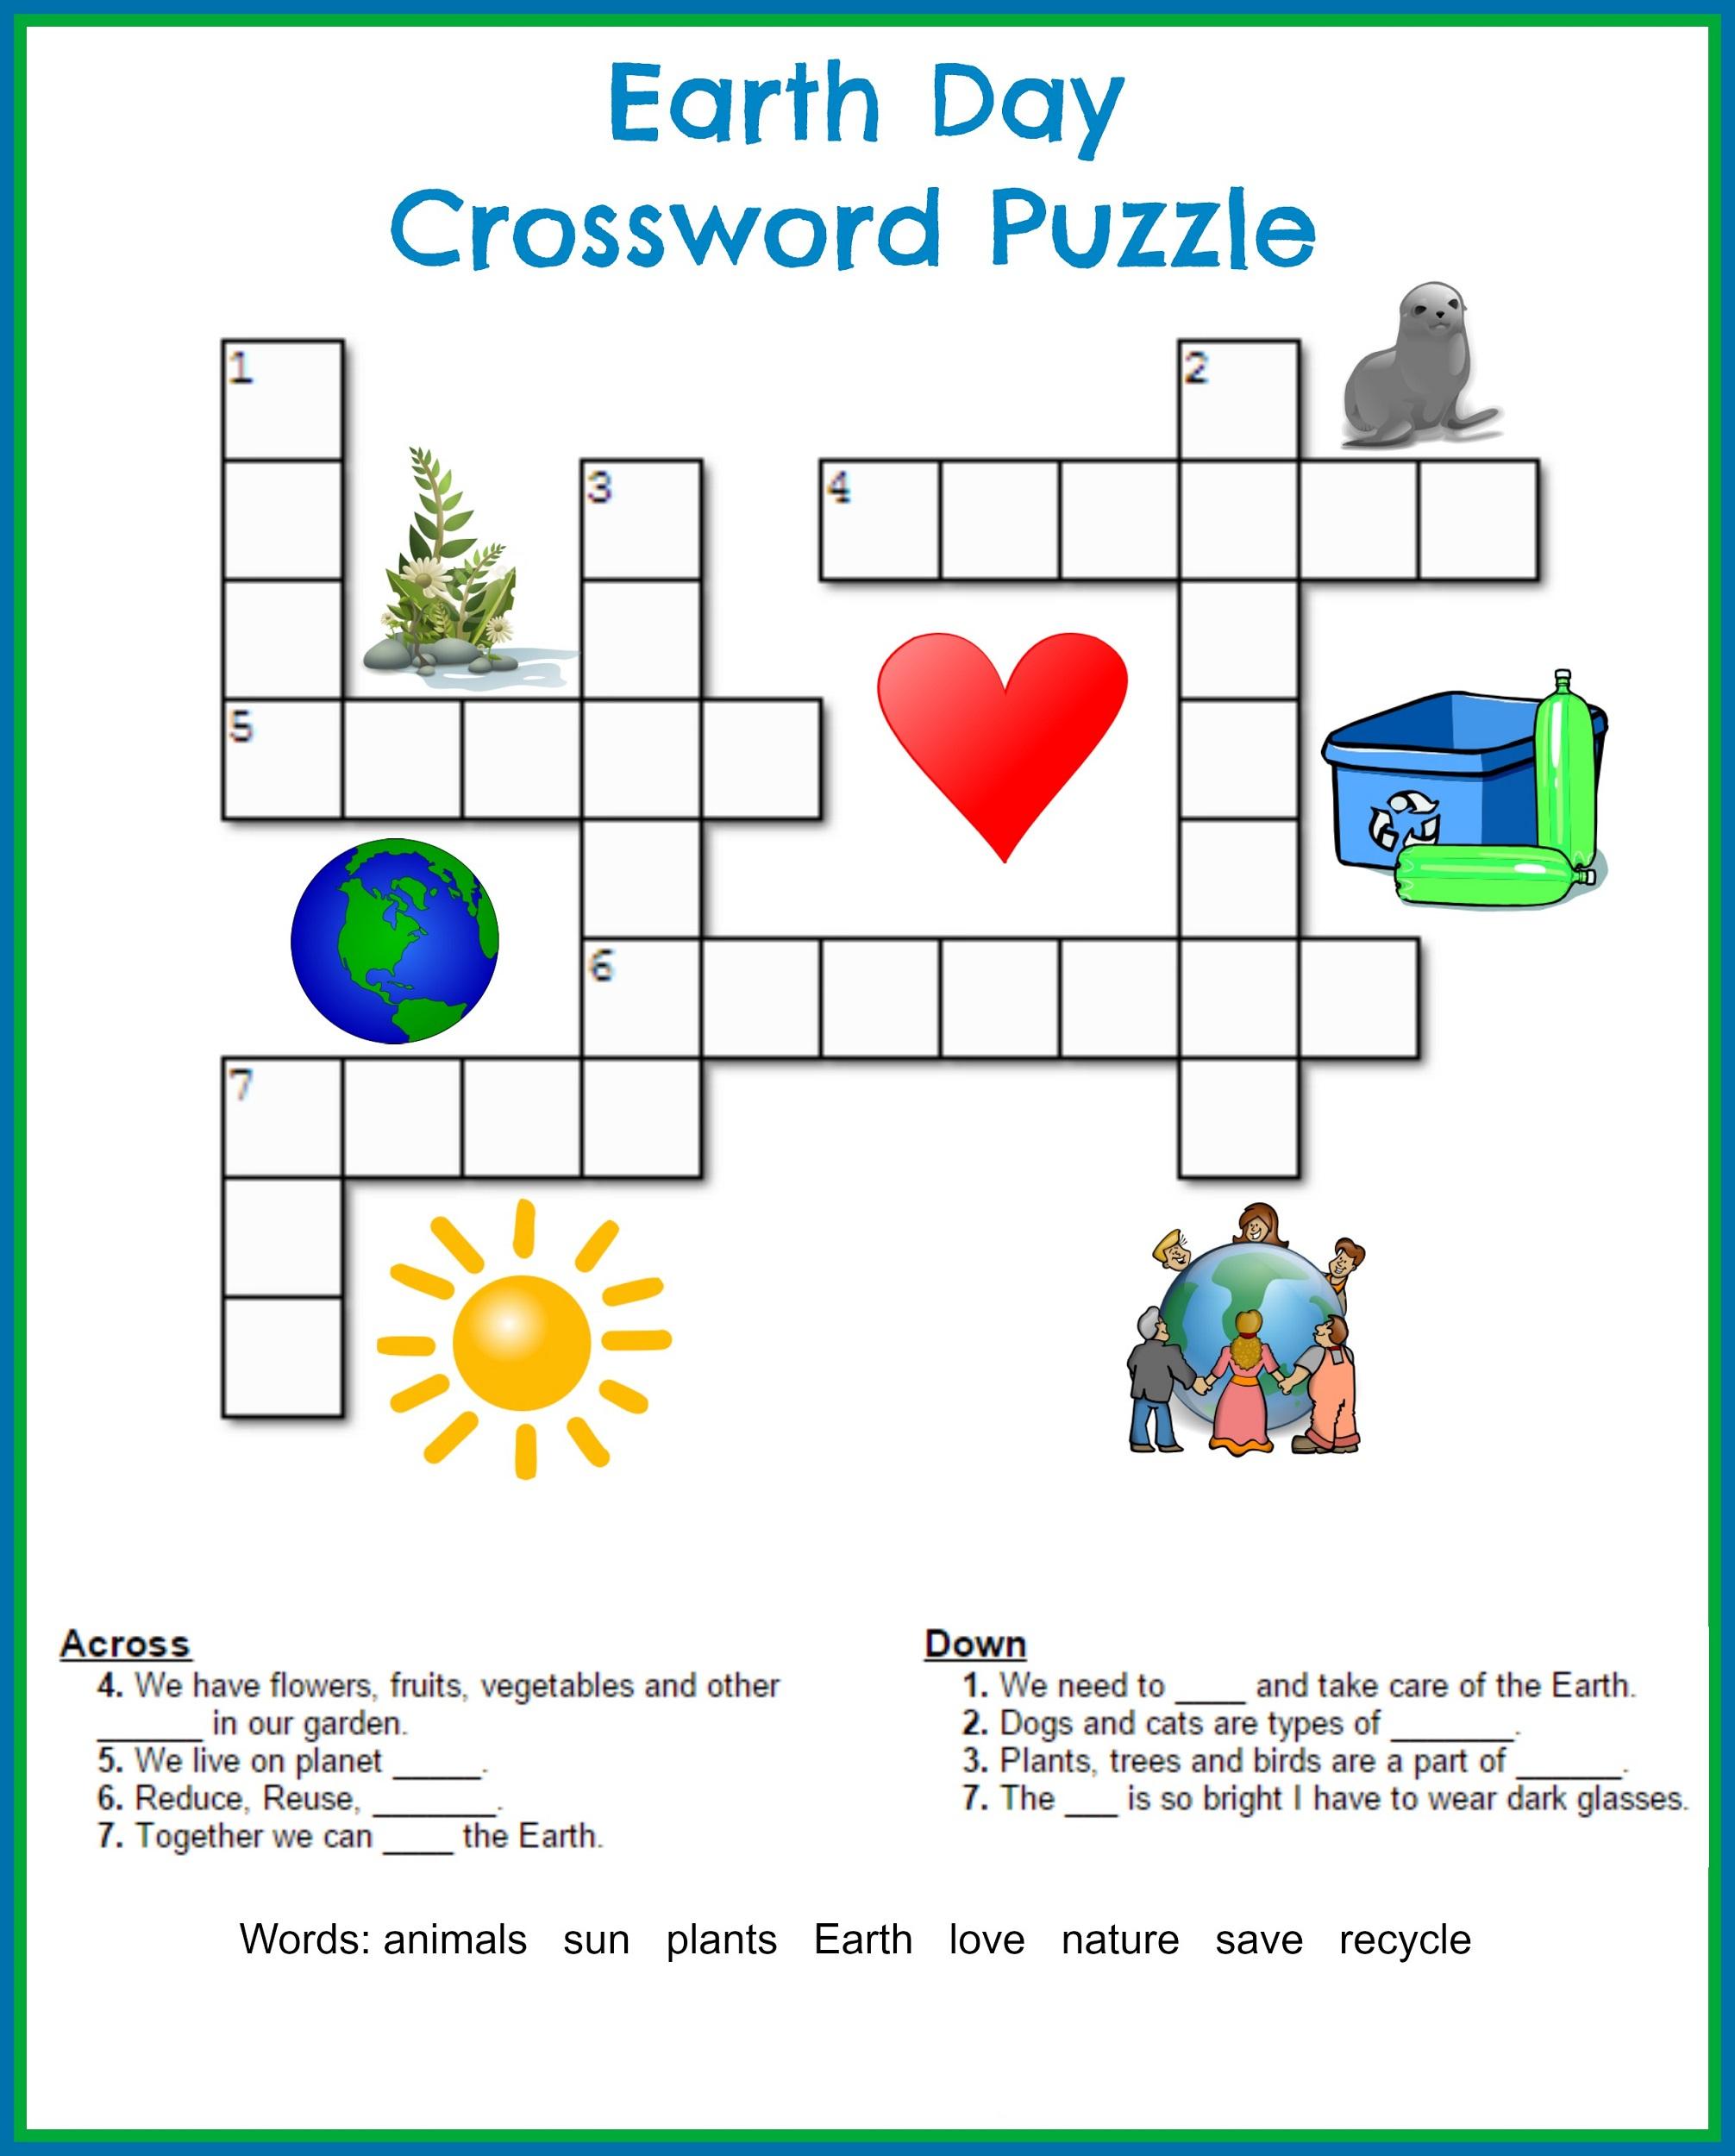 Printable Crosswords Puzzles Kids | Activity Shelter - Printable Crossword Puzzles For Students